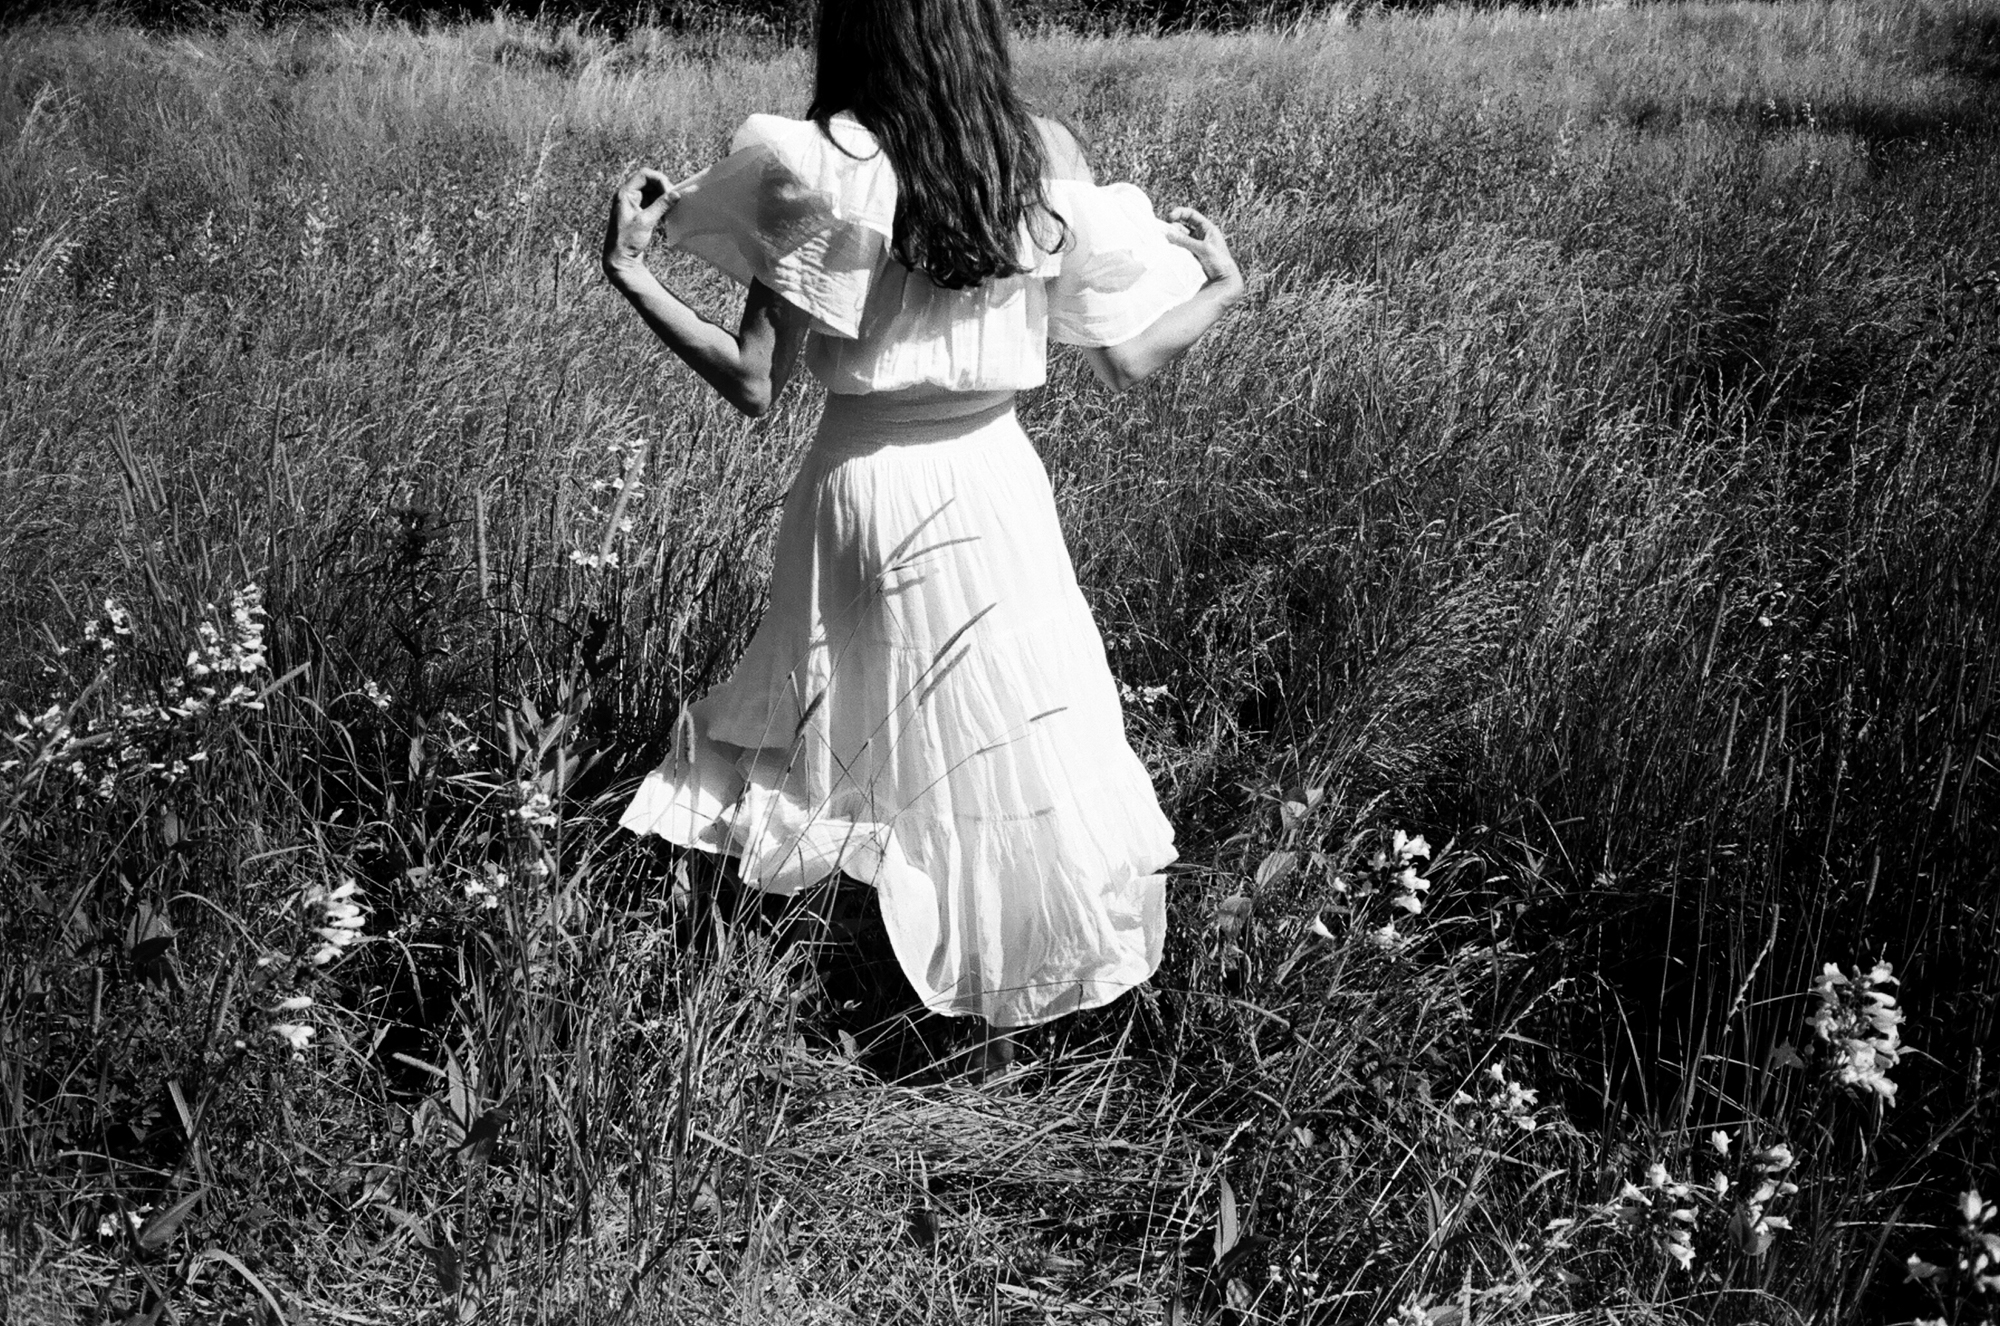 eitherand-anaak-summer-journal-7.jpg